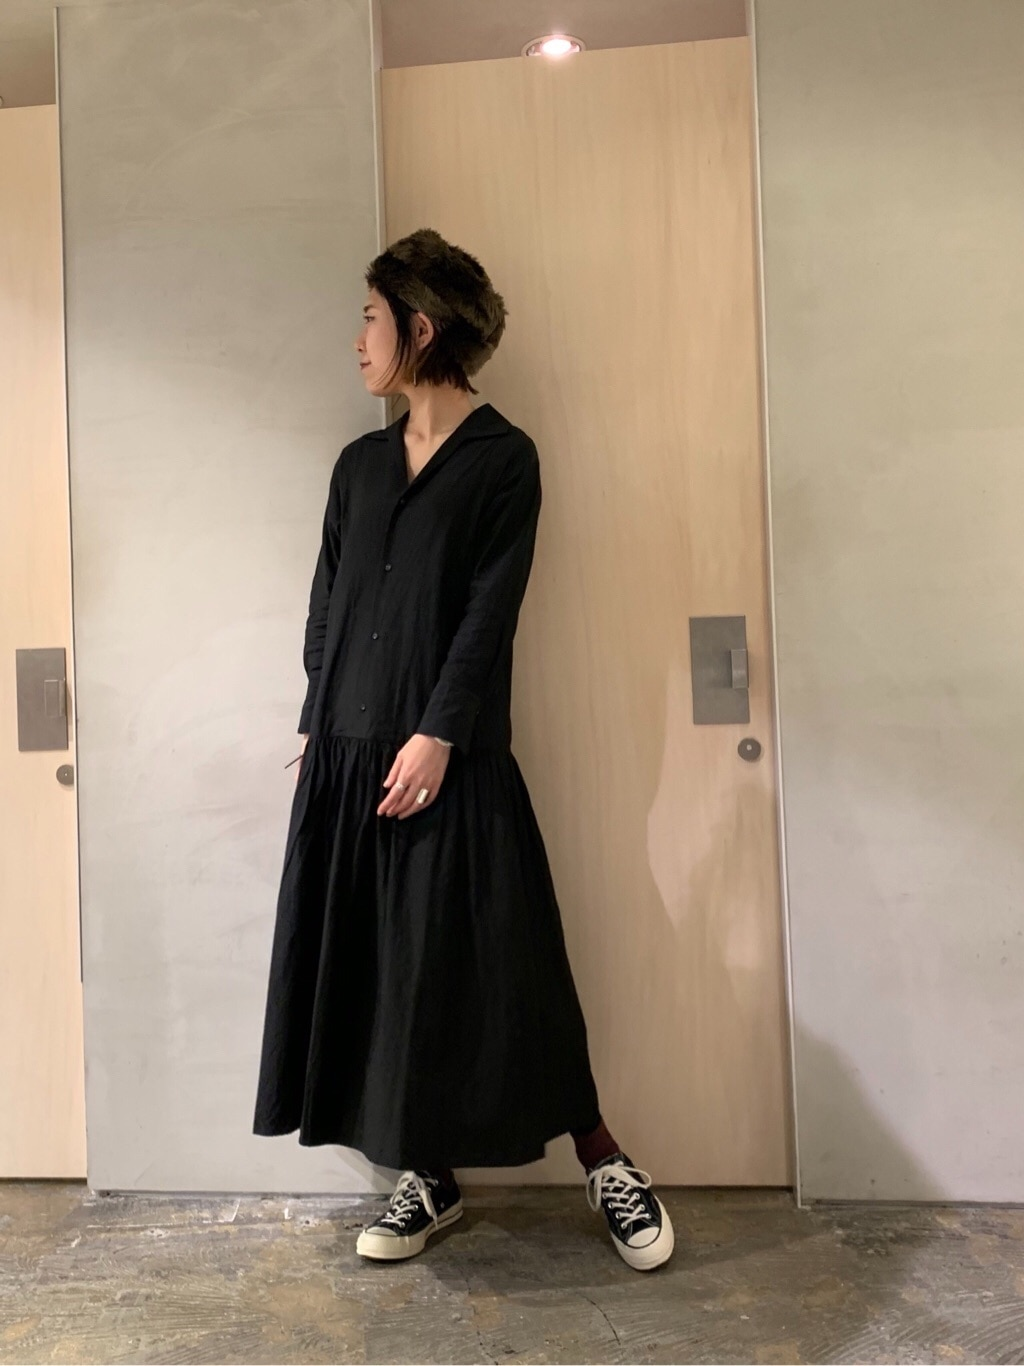 note et silence. ルミネ新宿 身長:169cm 2020.02.14